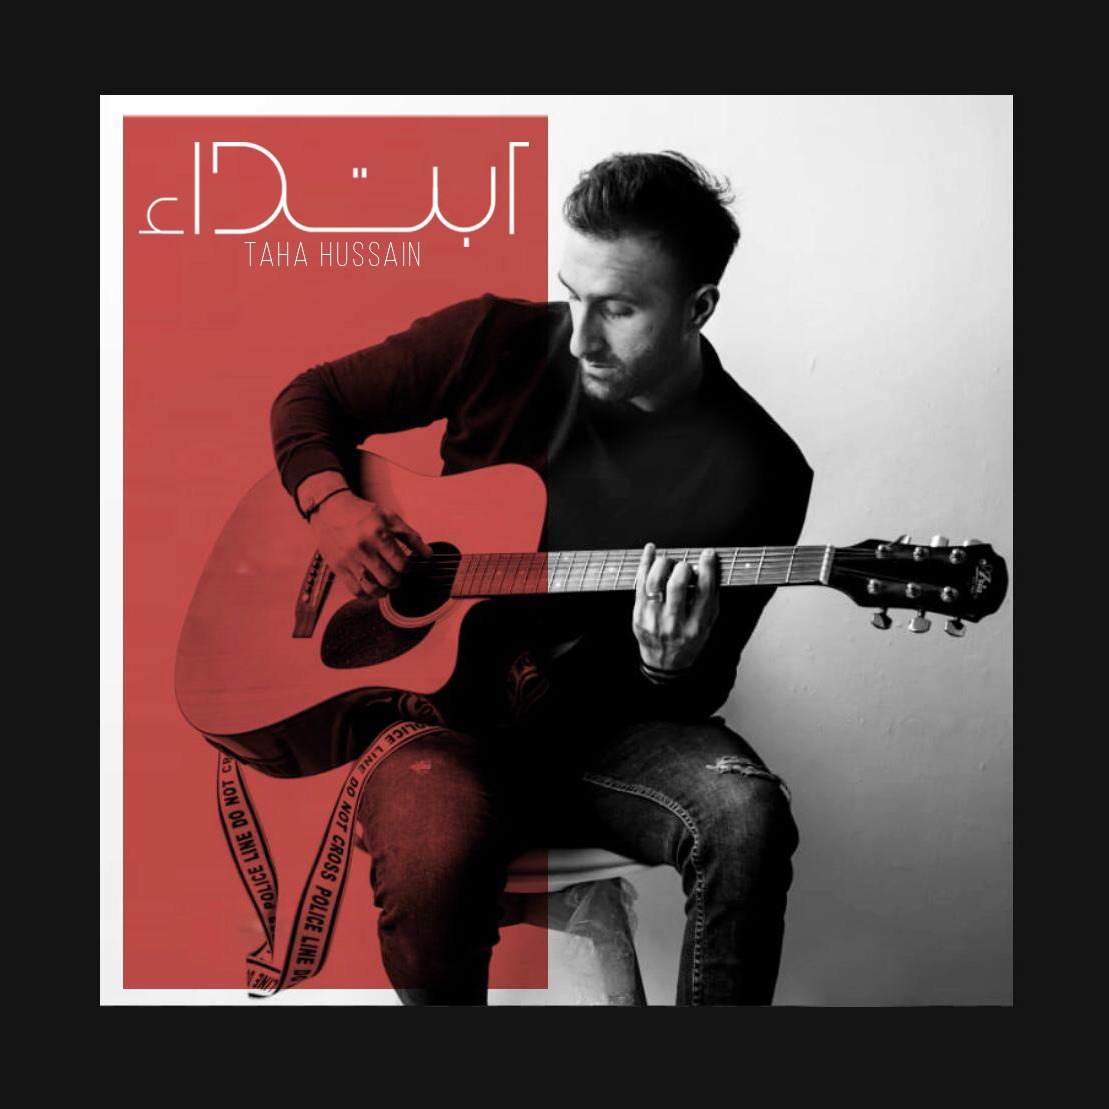 Taha Hussain - Ibtia - Album Cover [F]